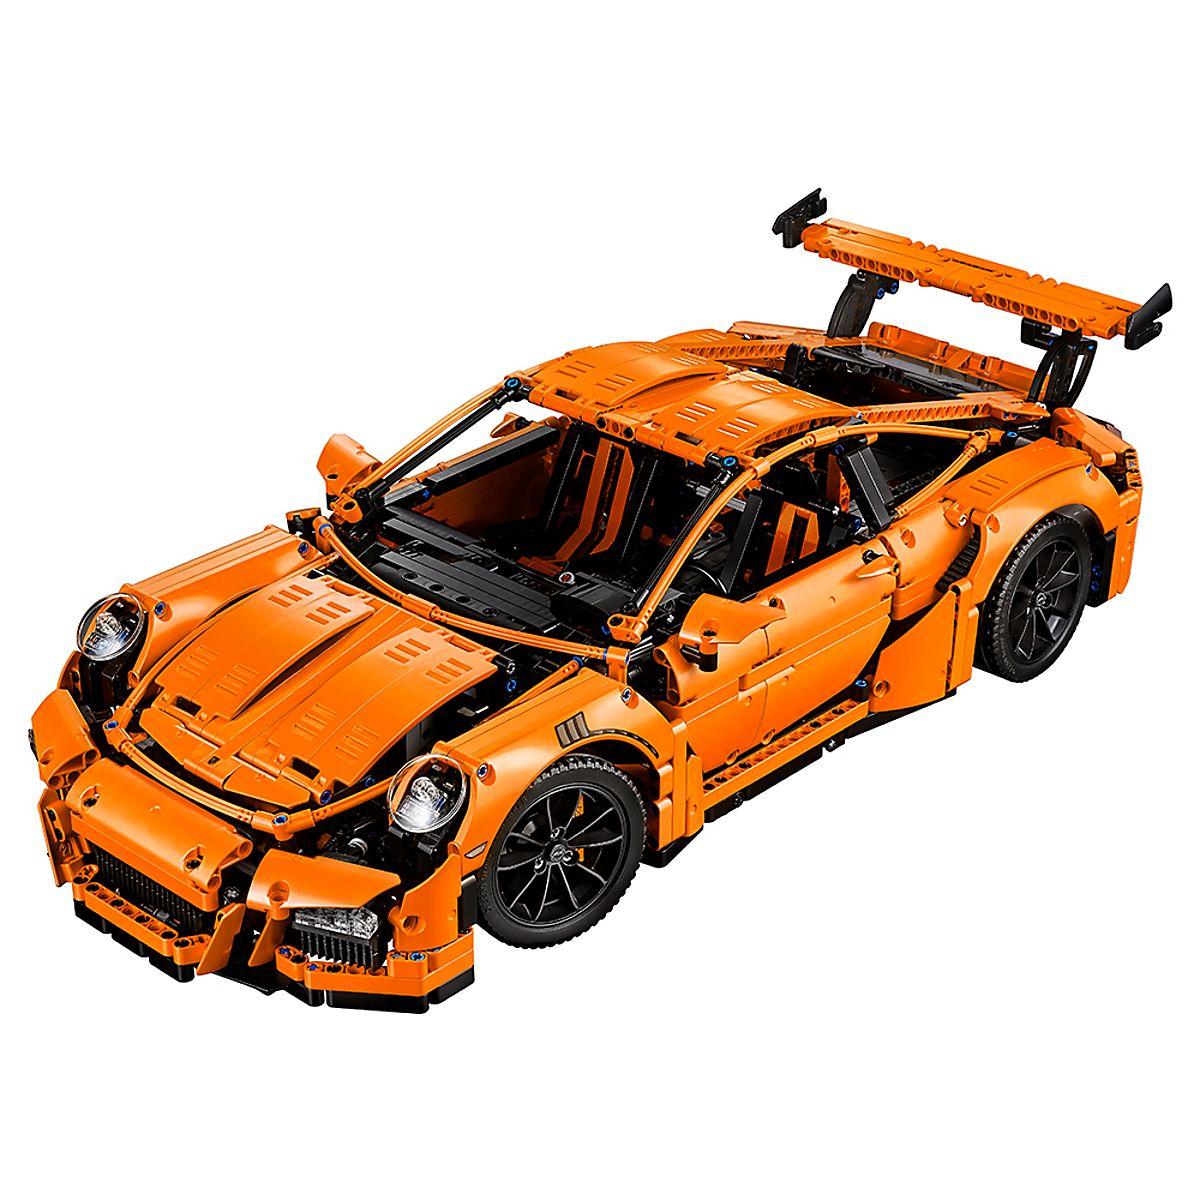 Porsche 911 Gt3 Rs 42056 Technic Buy Online At The Official Lego Shop Ca